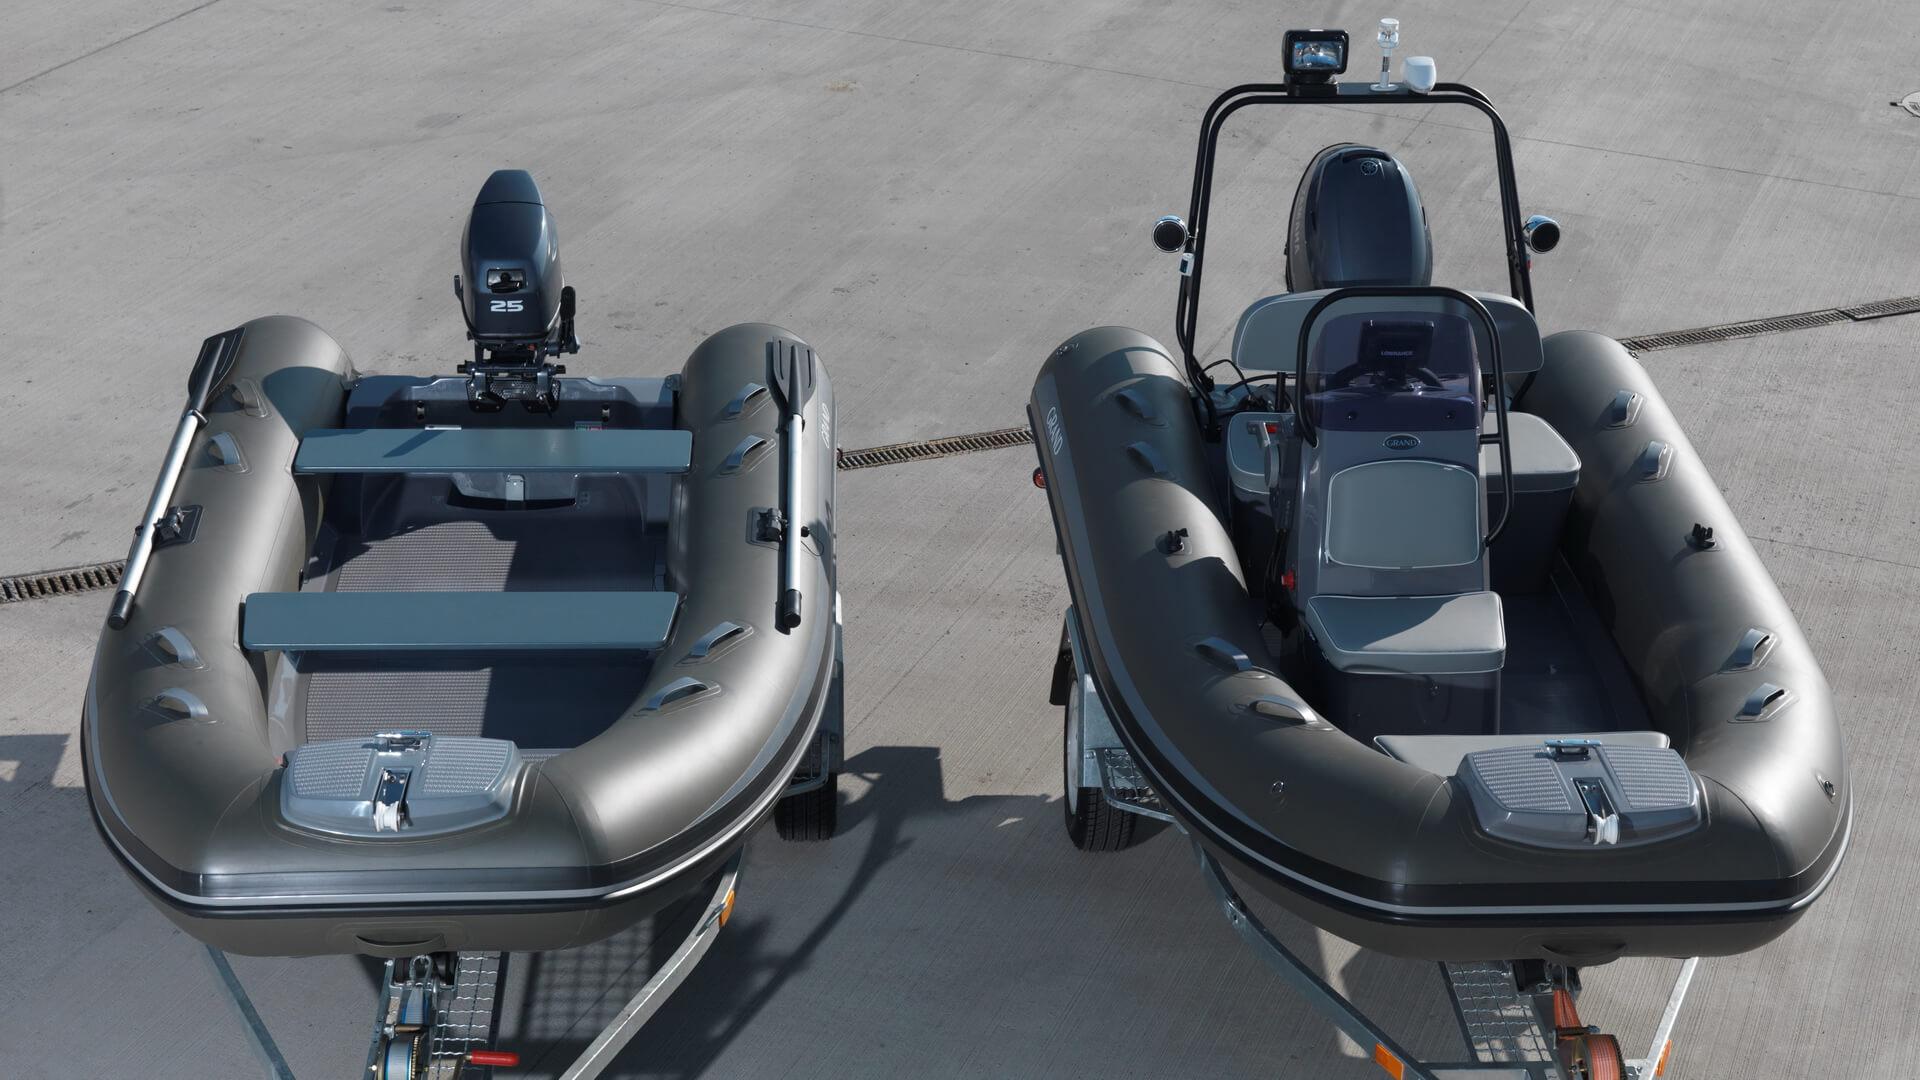 Надувная лодка с жестким дном GRAND Silver Line S370N, Надувная лодка GRAND Silver Line S370N, GRAND Silver Line S370NF, GRAND Silver Line S370N, GRAND S370NF, GRAND S370N, GRAND S370, Надувная лодка GRAND, Надувная лодка ГРАНД, Надувная лодка с жестким дном, RIB, Rigid Inflatable Boats